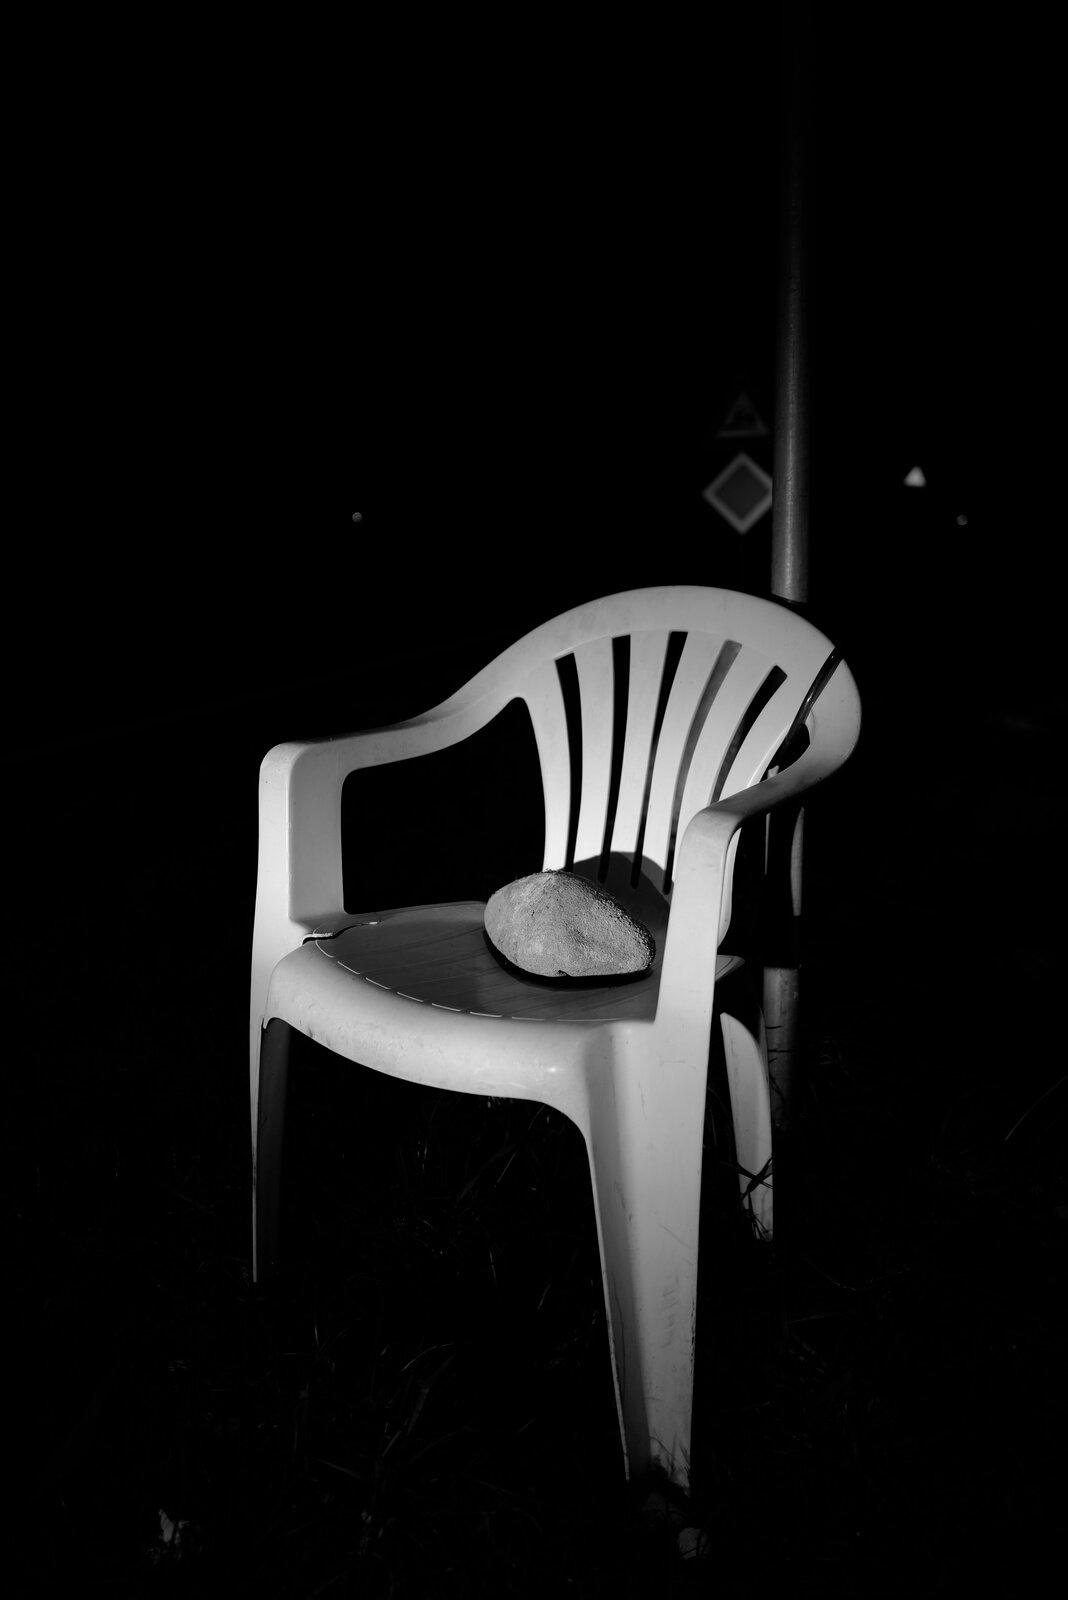 17_The-Absence_Attilio-Solzi